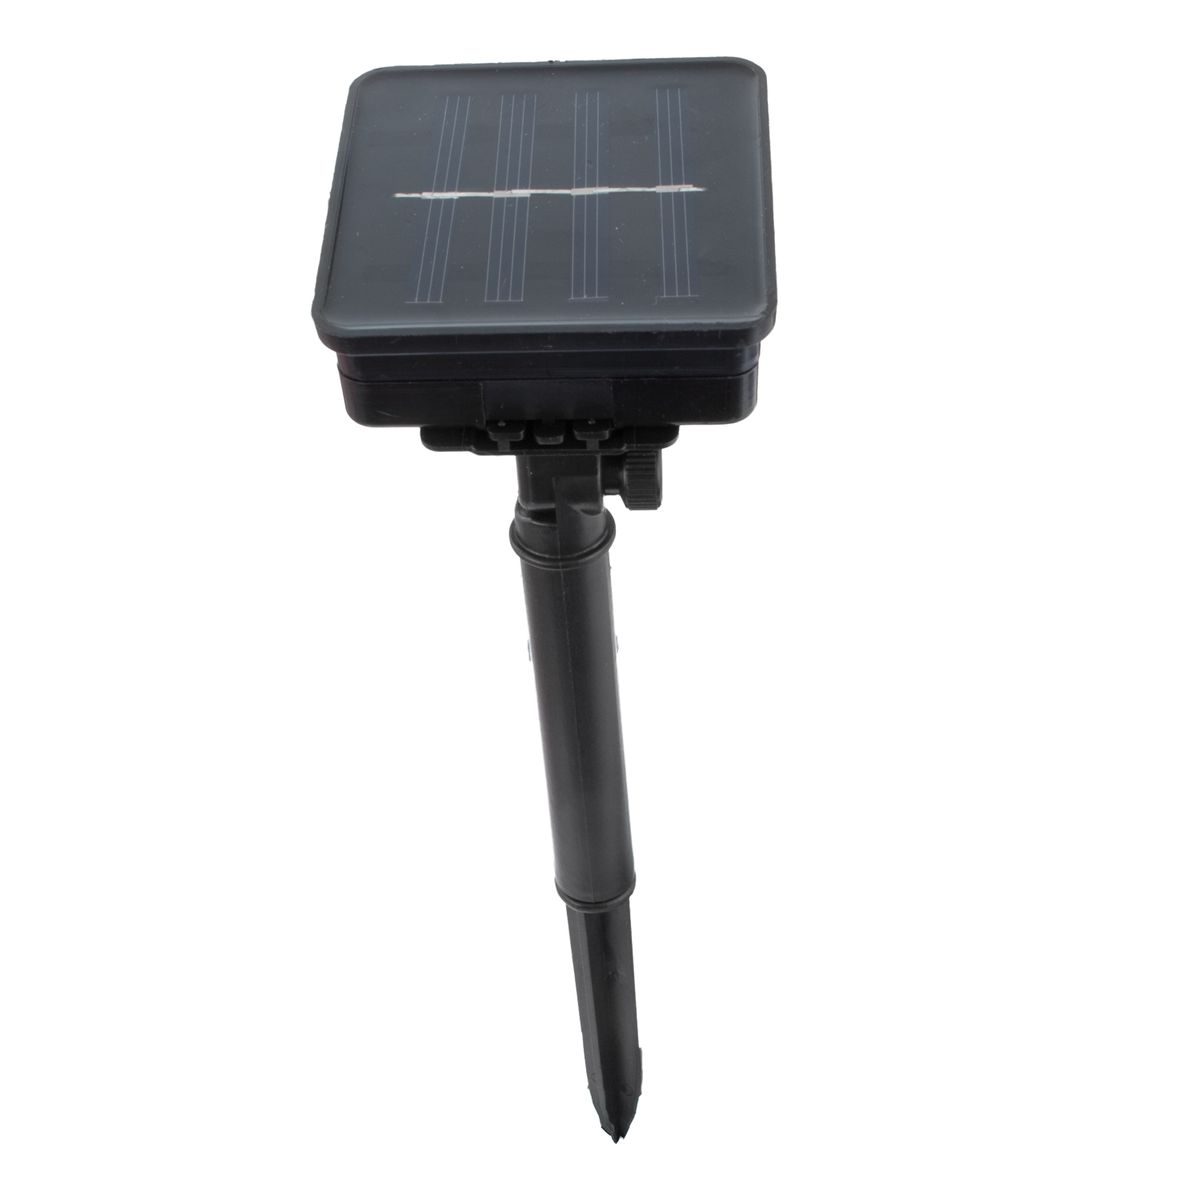 Solar Lichterkette Flamingo BT1705 Solar – Bild 6